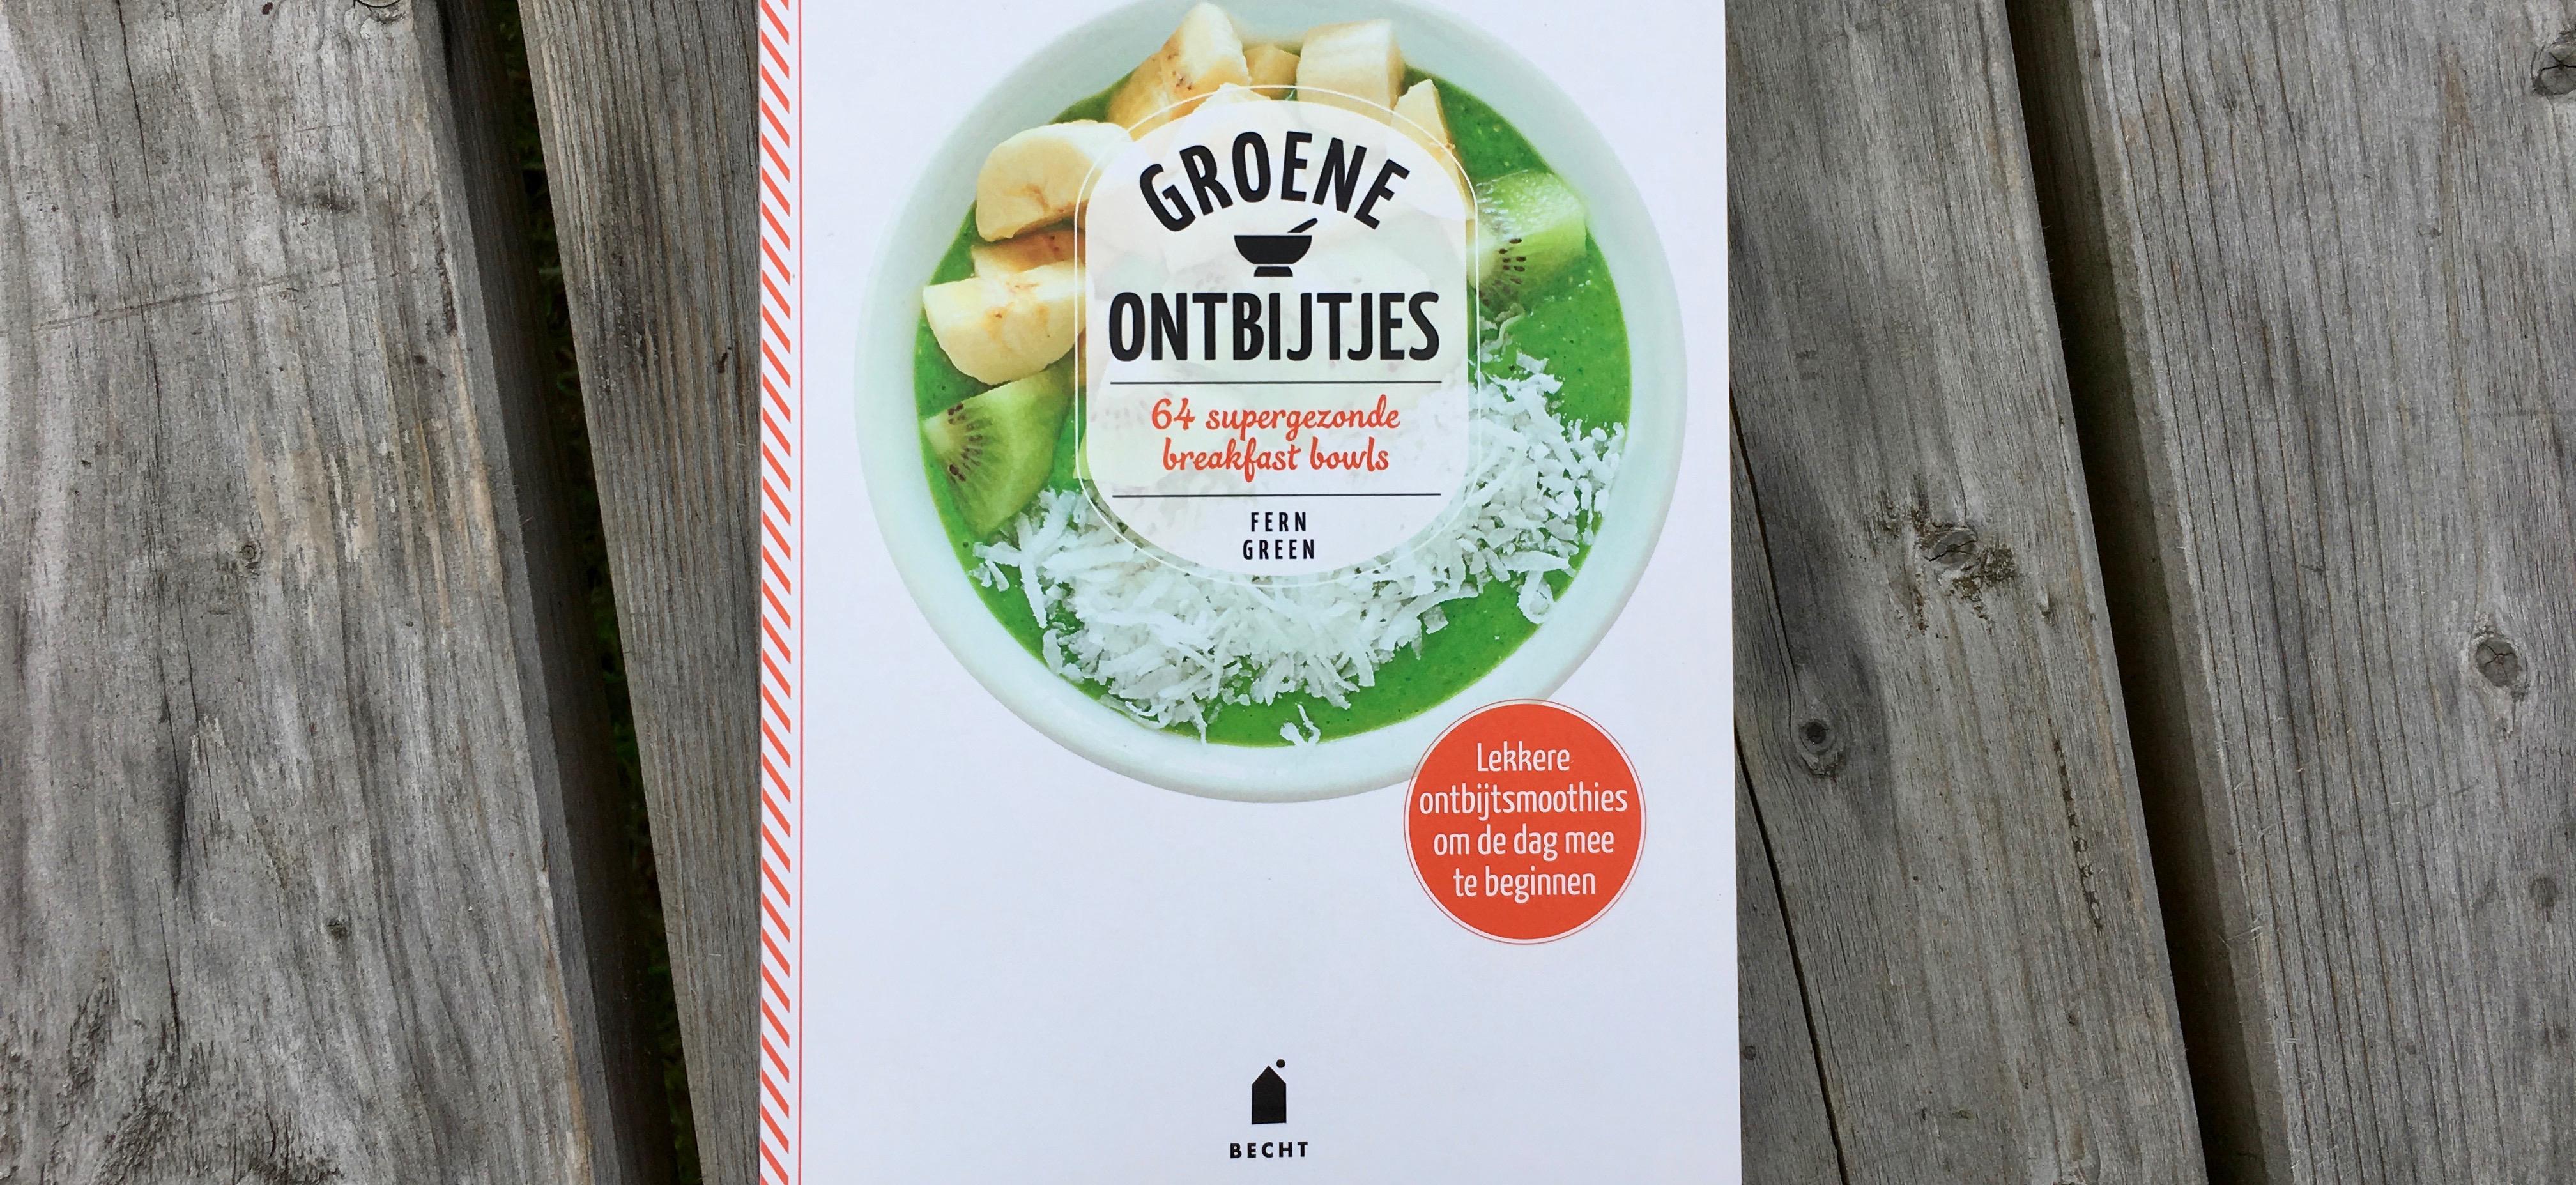 Review: Groene ontbijtjes